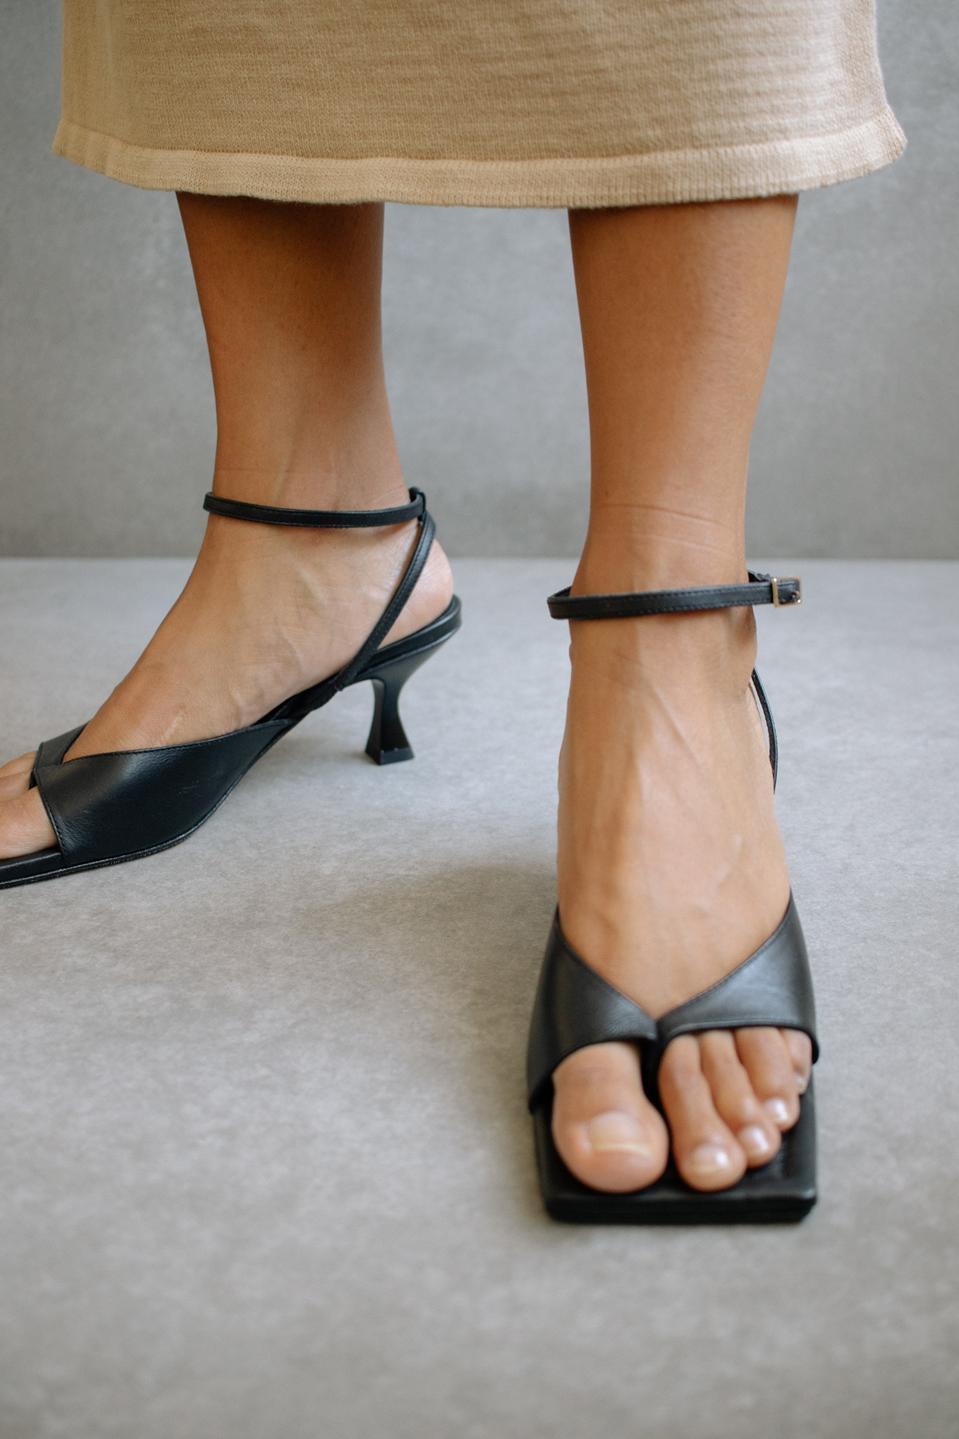 Martini Black sandal, by Alohas.